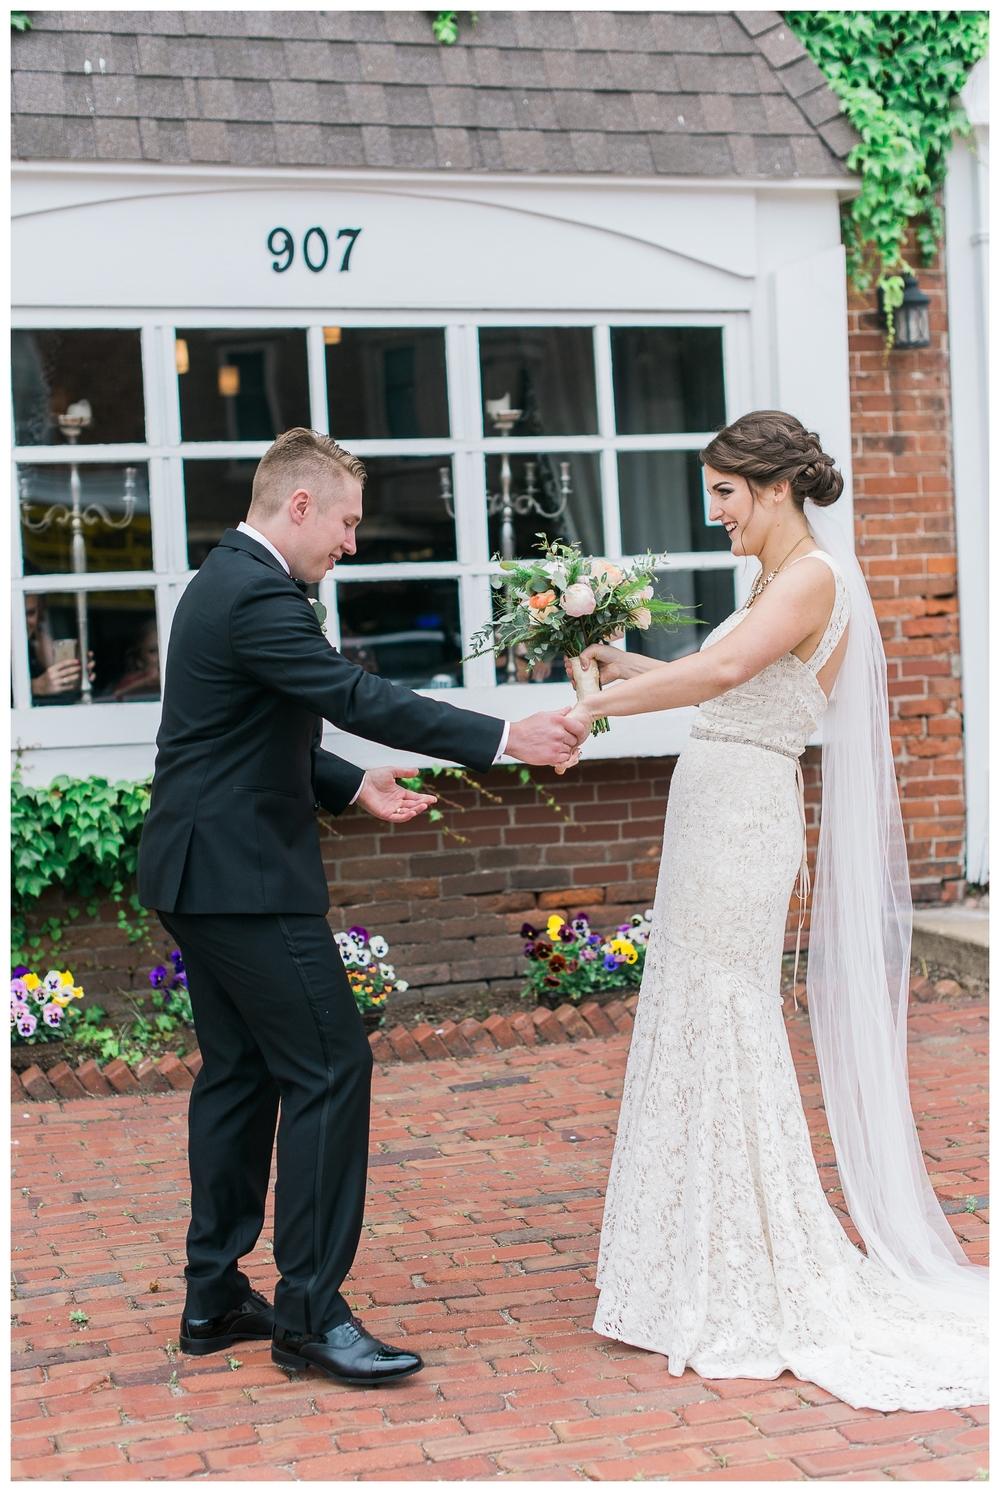 Rebecca_Bridges_Photography_Indianapolis_Wedding_Photographer_4383.jpg